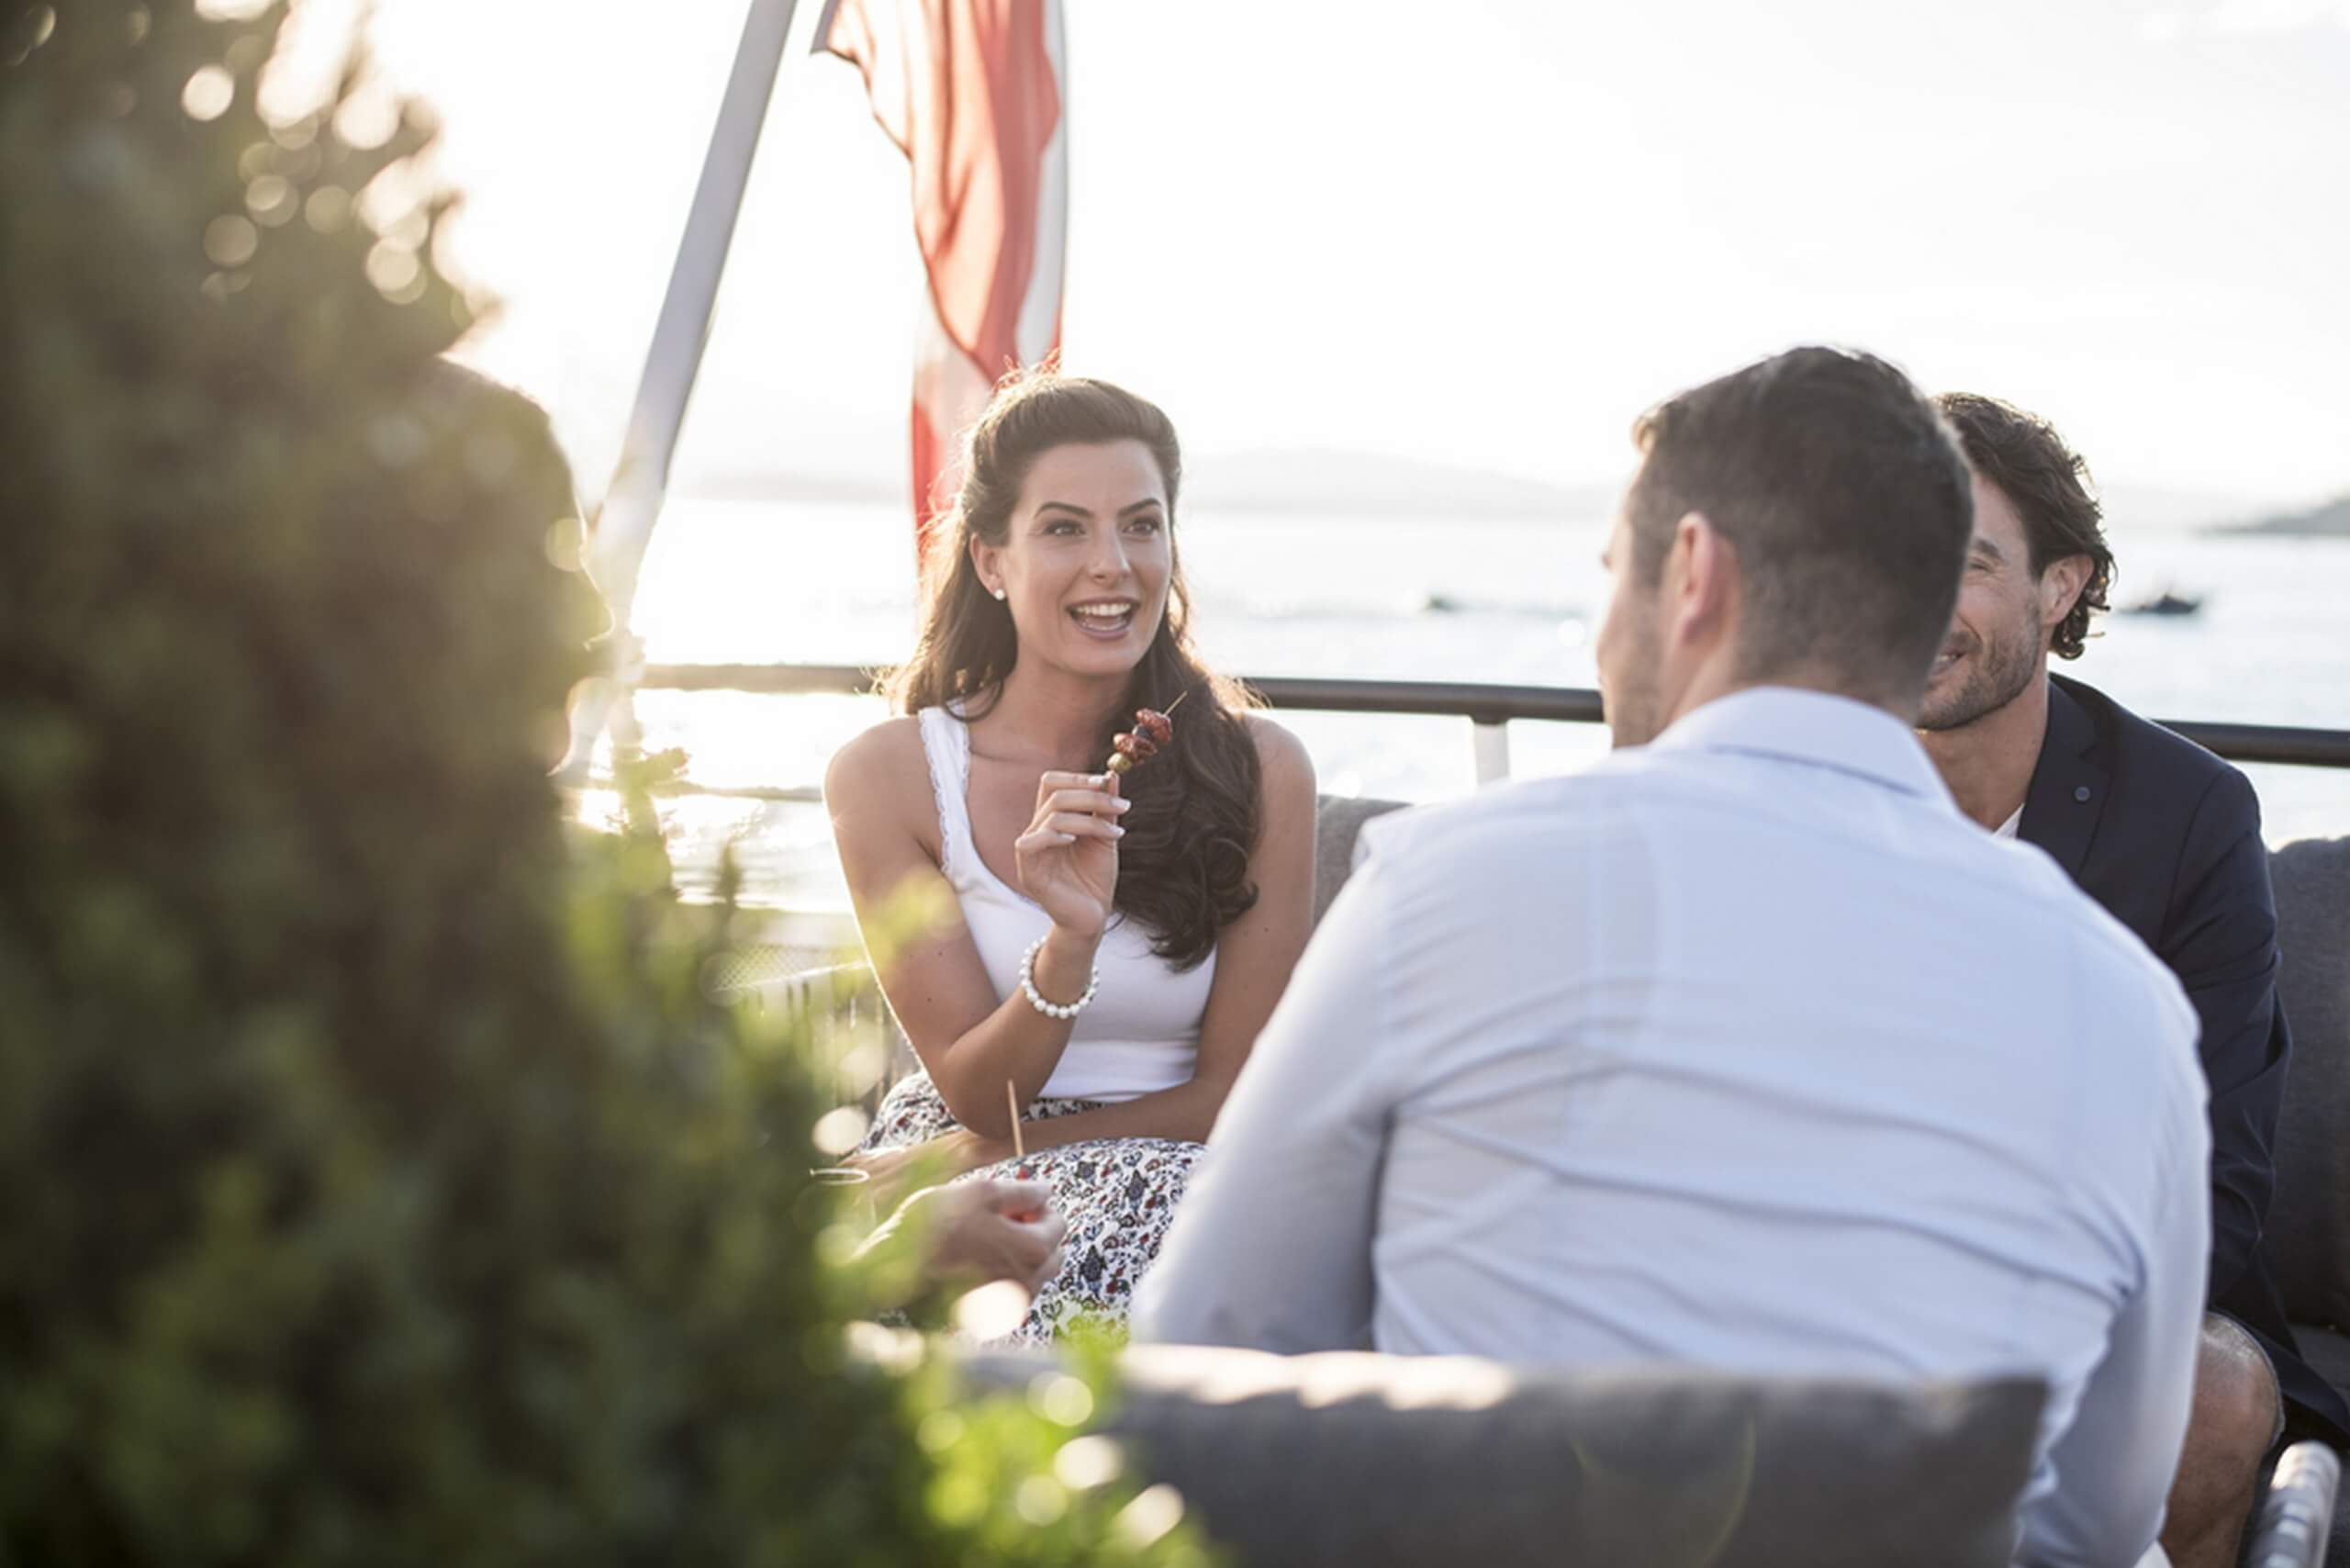 thunersee-bls-schifffahrt-kulinarik-verpflegung-sommer